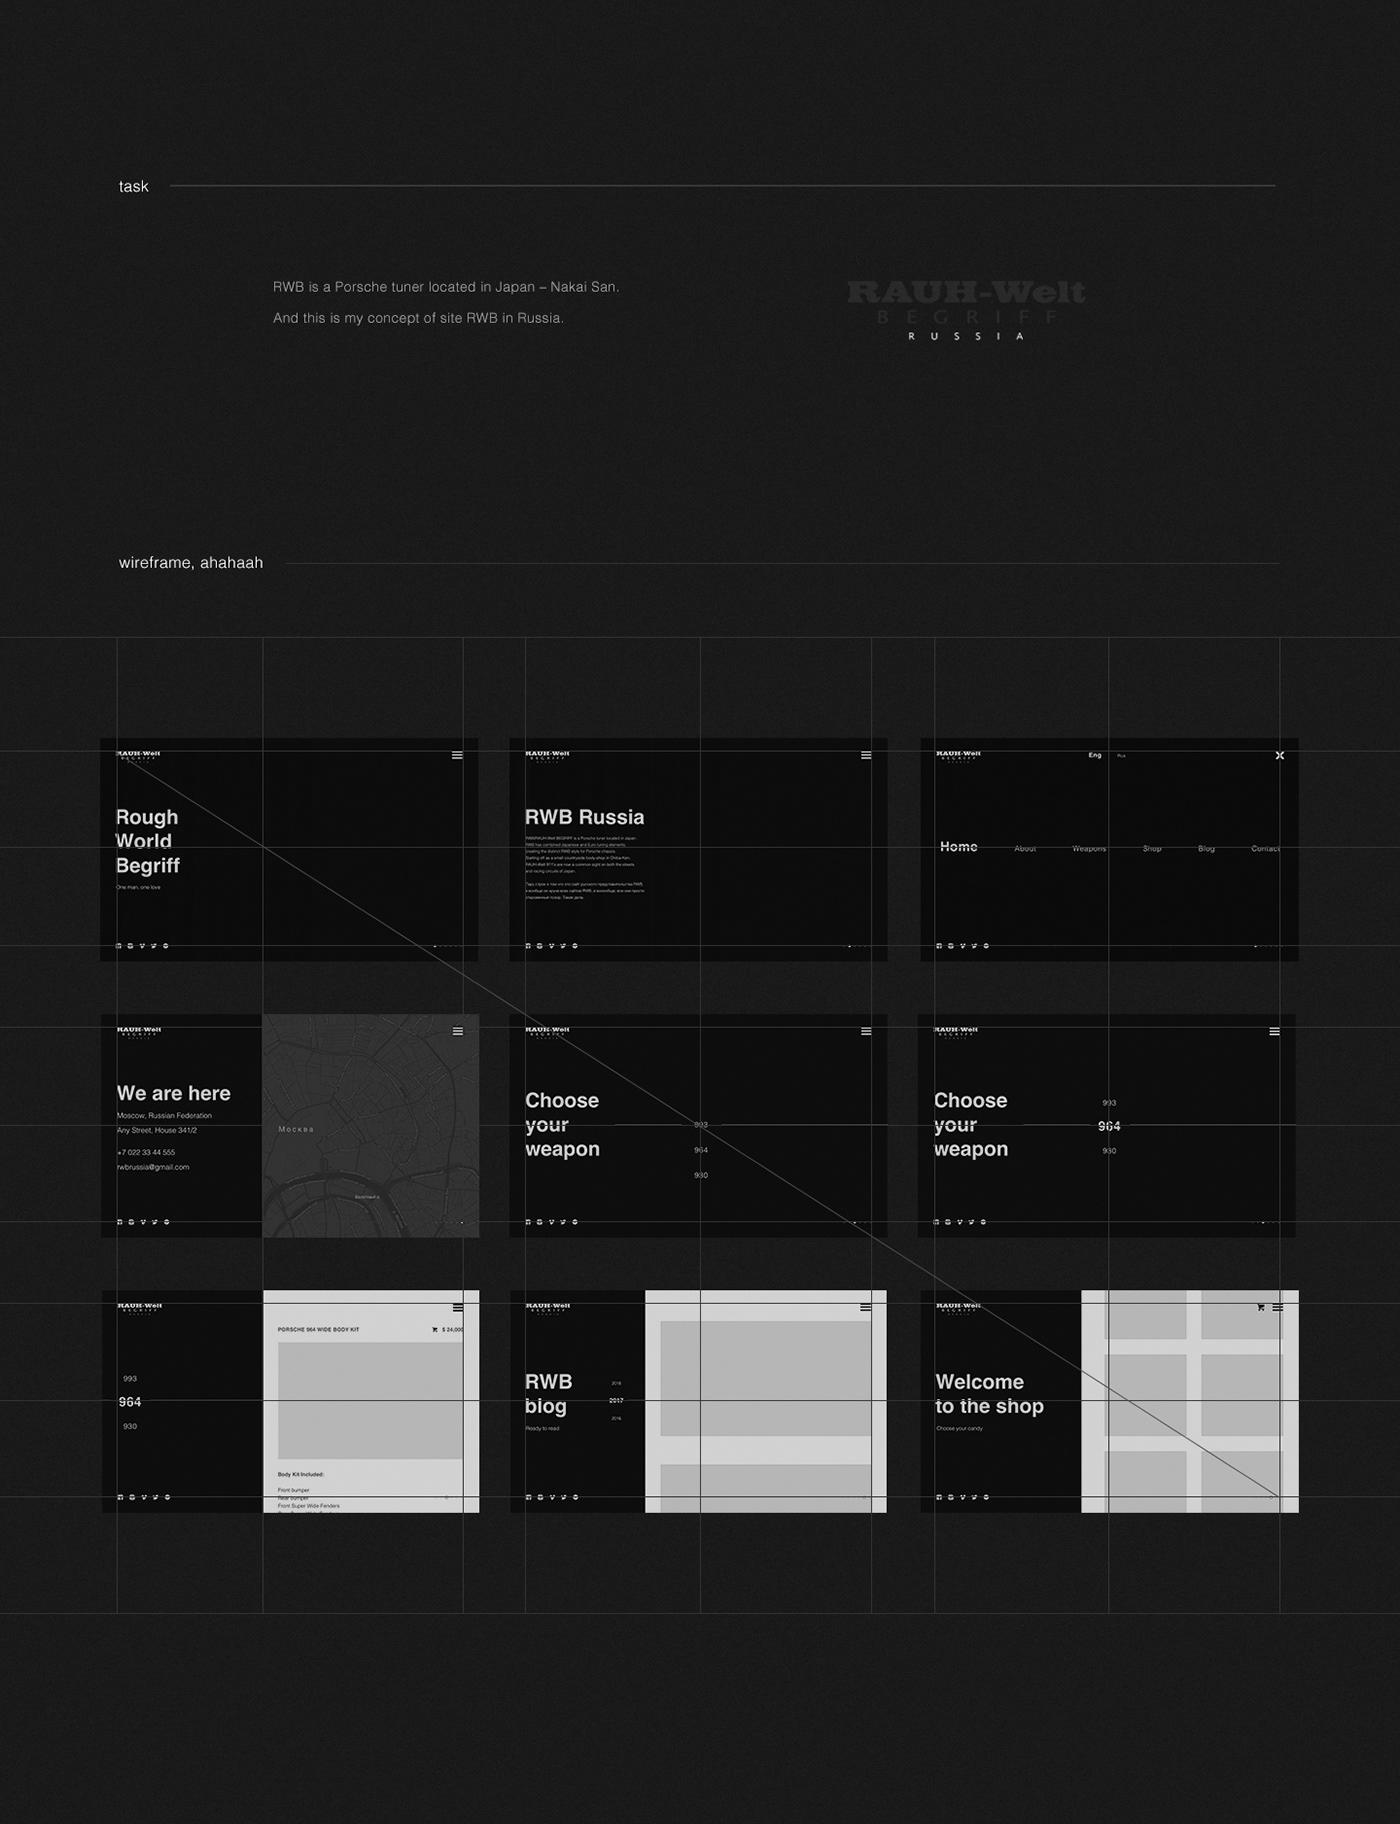 Vlasuhiro ux UI design RWB Porsche tuning Russia dark minimal